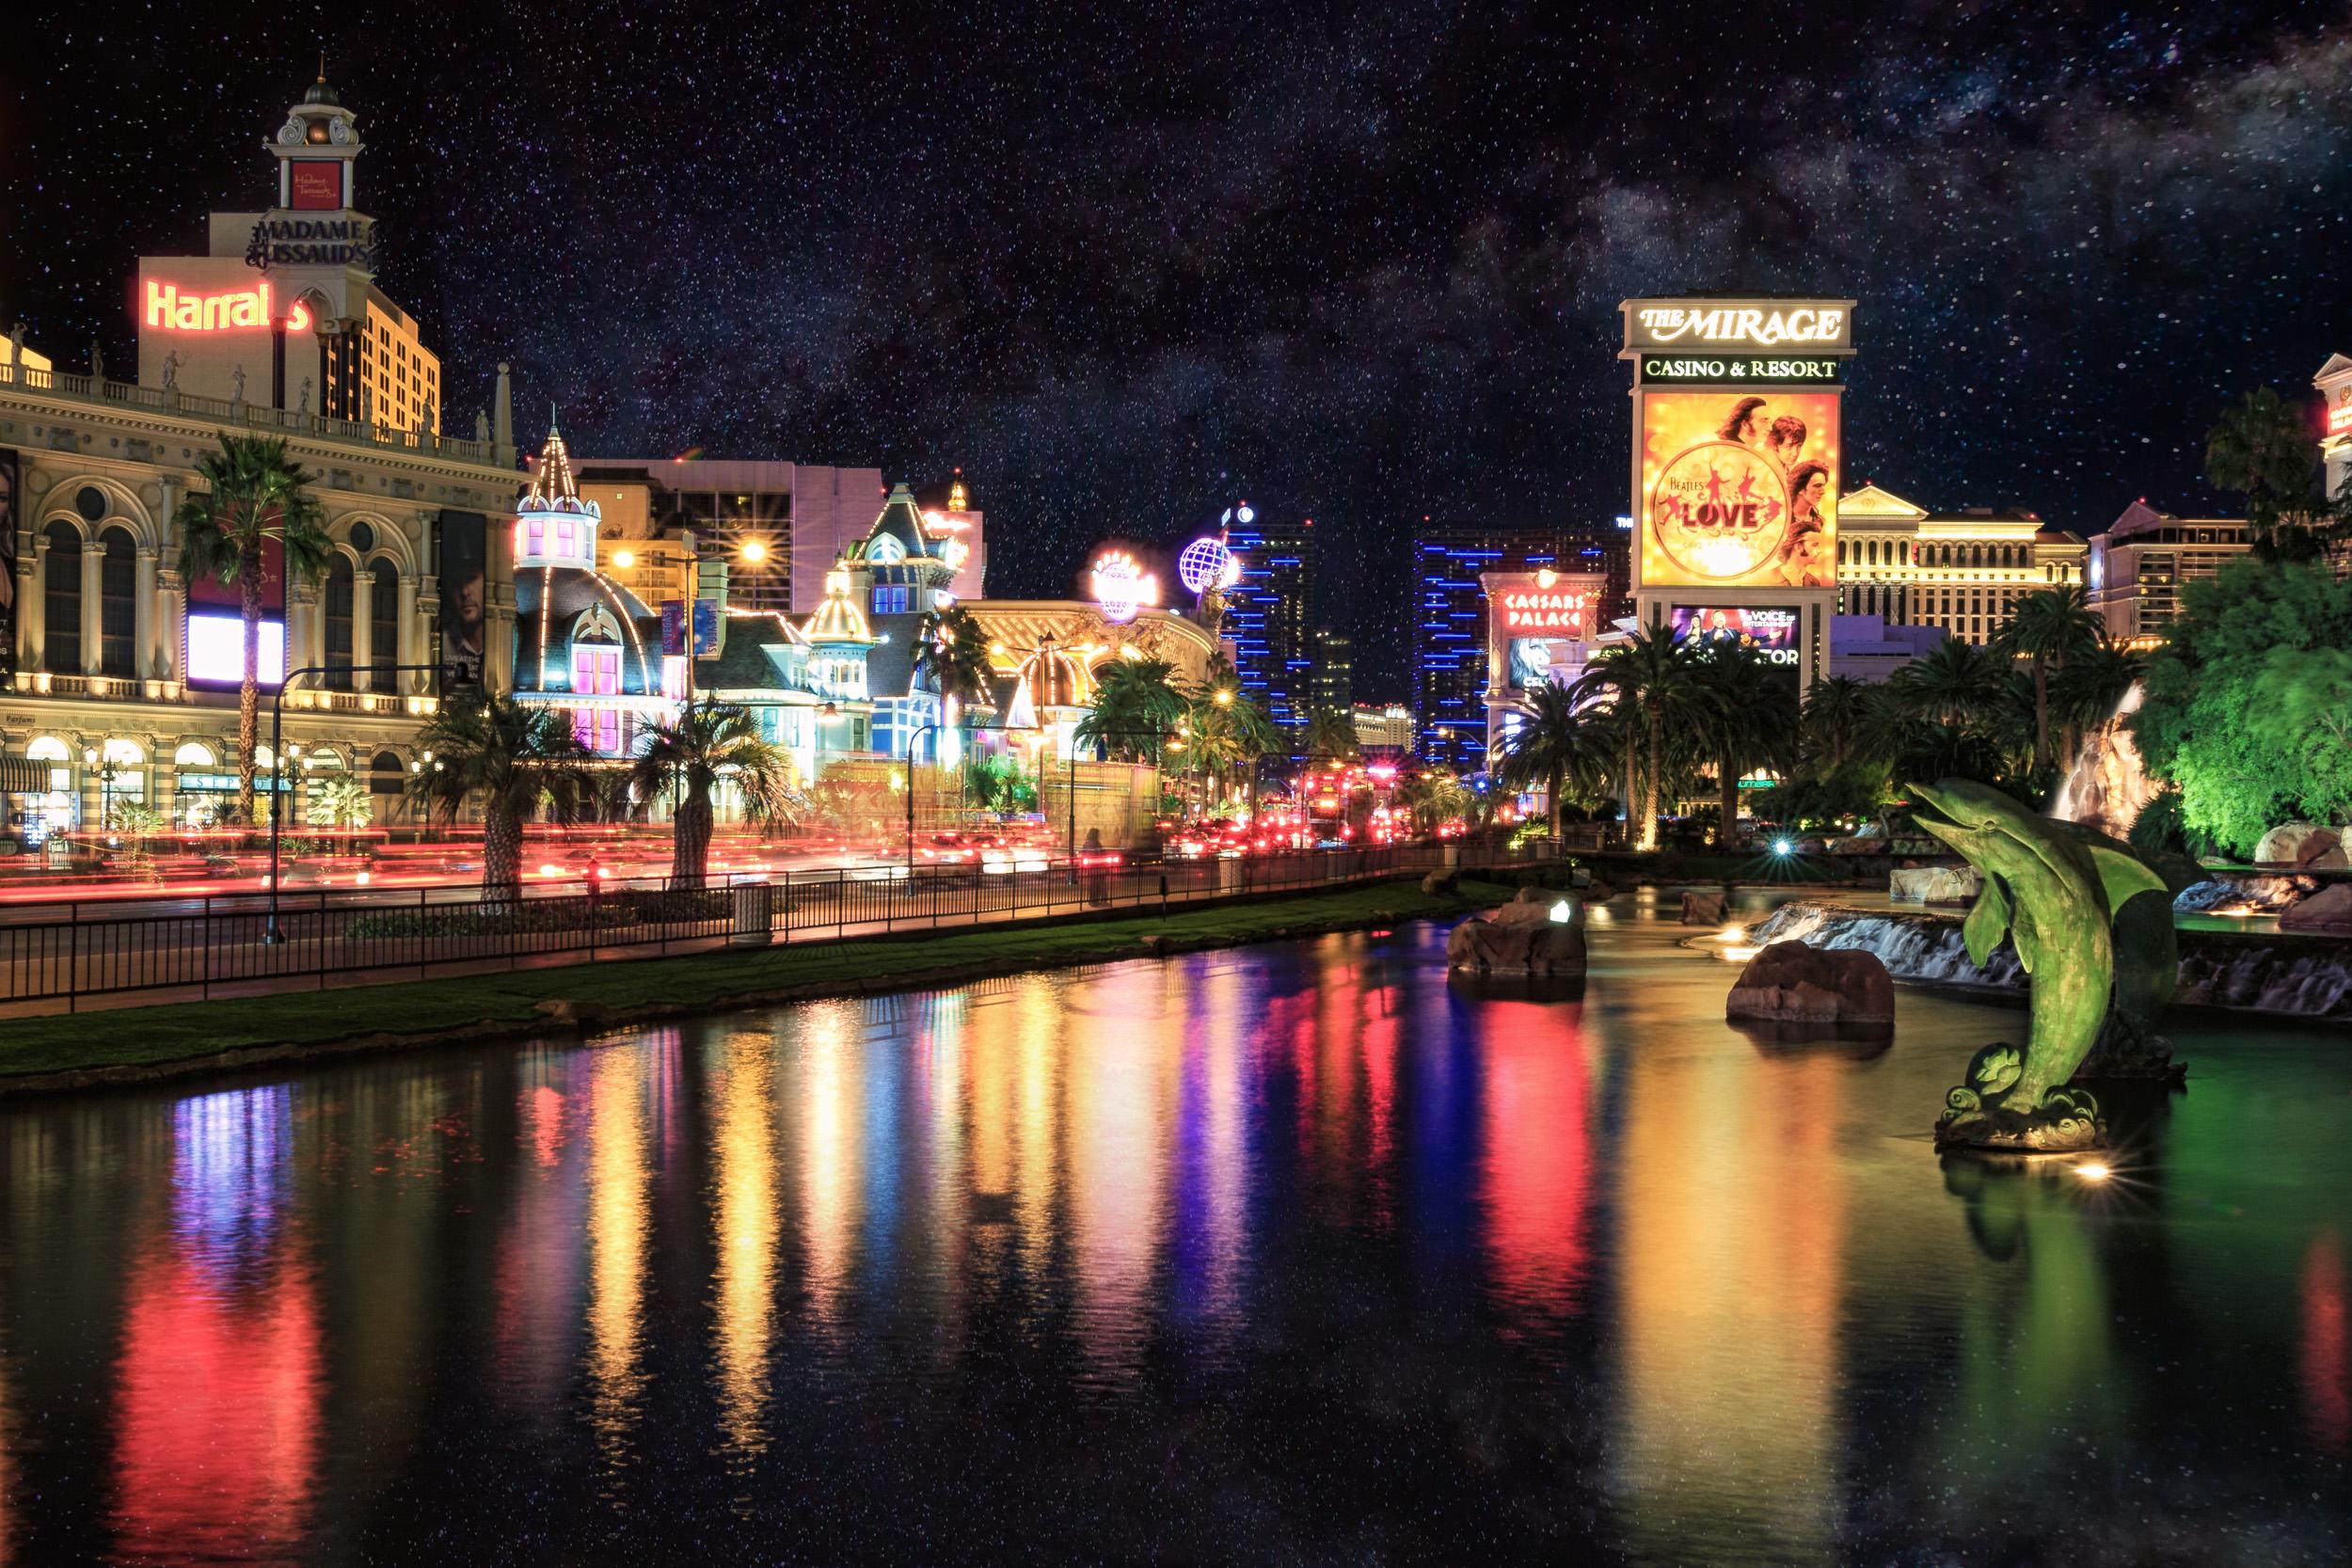 Las_Vergas_Night_Miami_Fort_Lauderdale_commercial_photographer_Franklin_Castillo.jpg